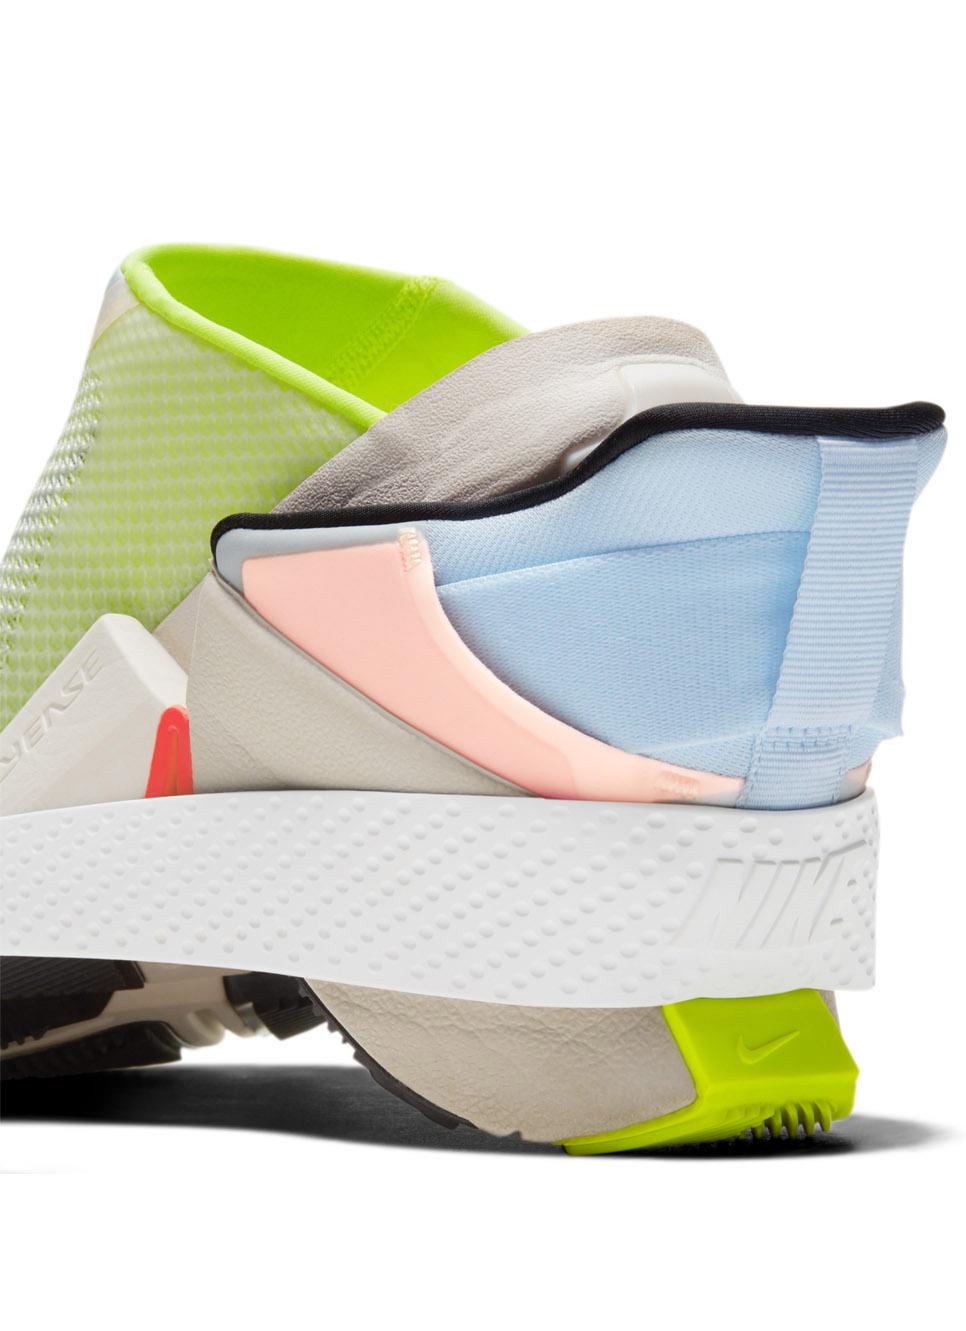 stilosissimo - Nike Go FlyEase